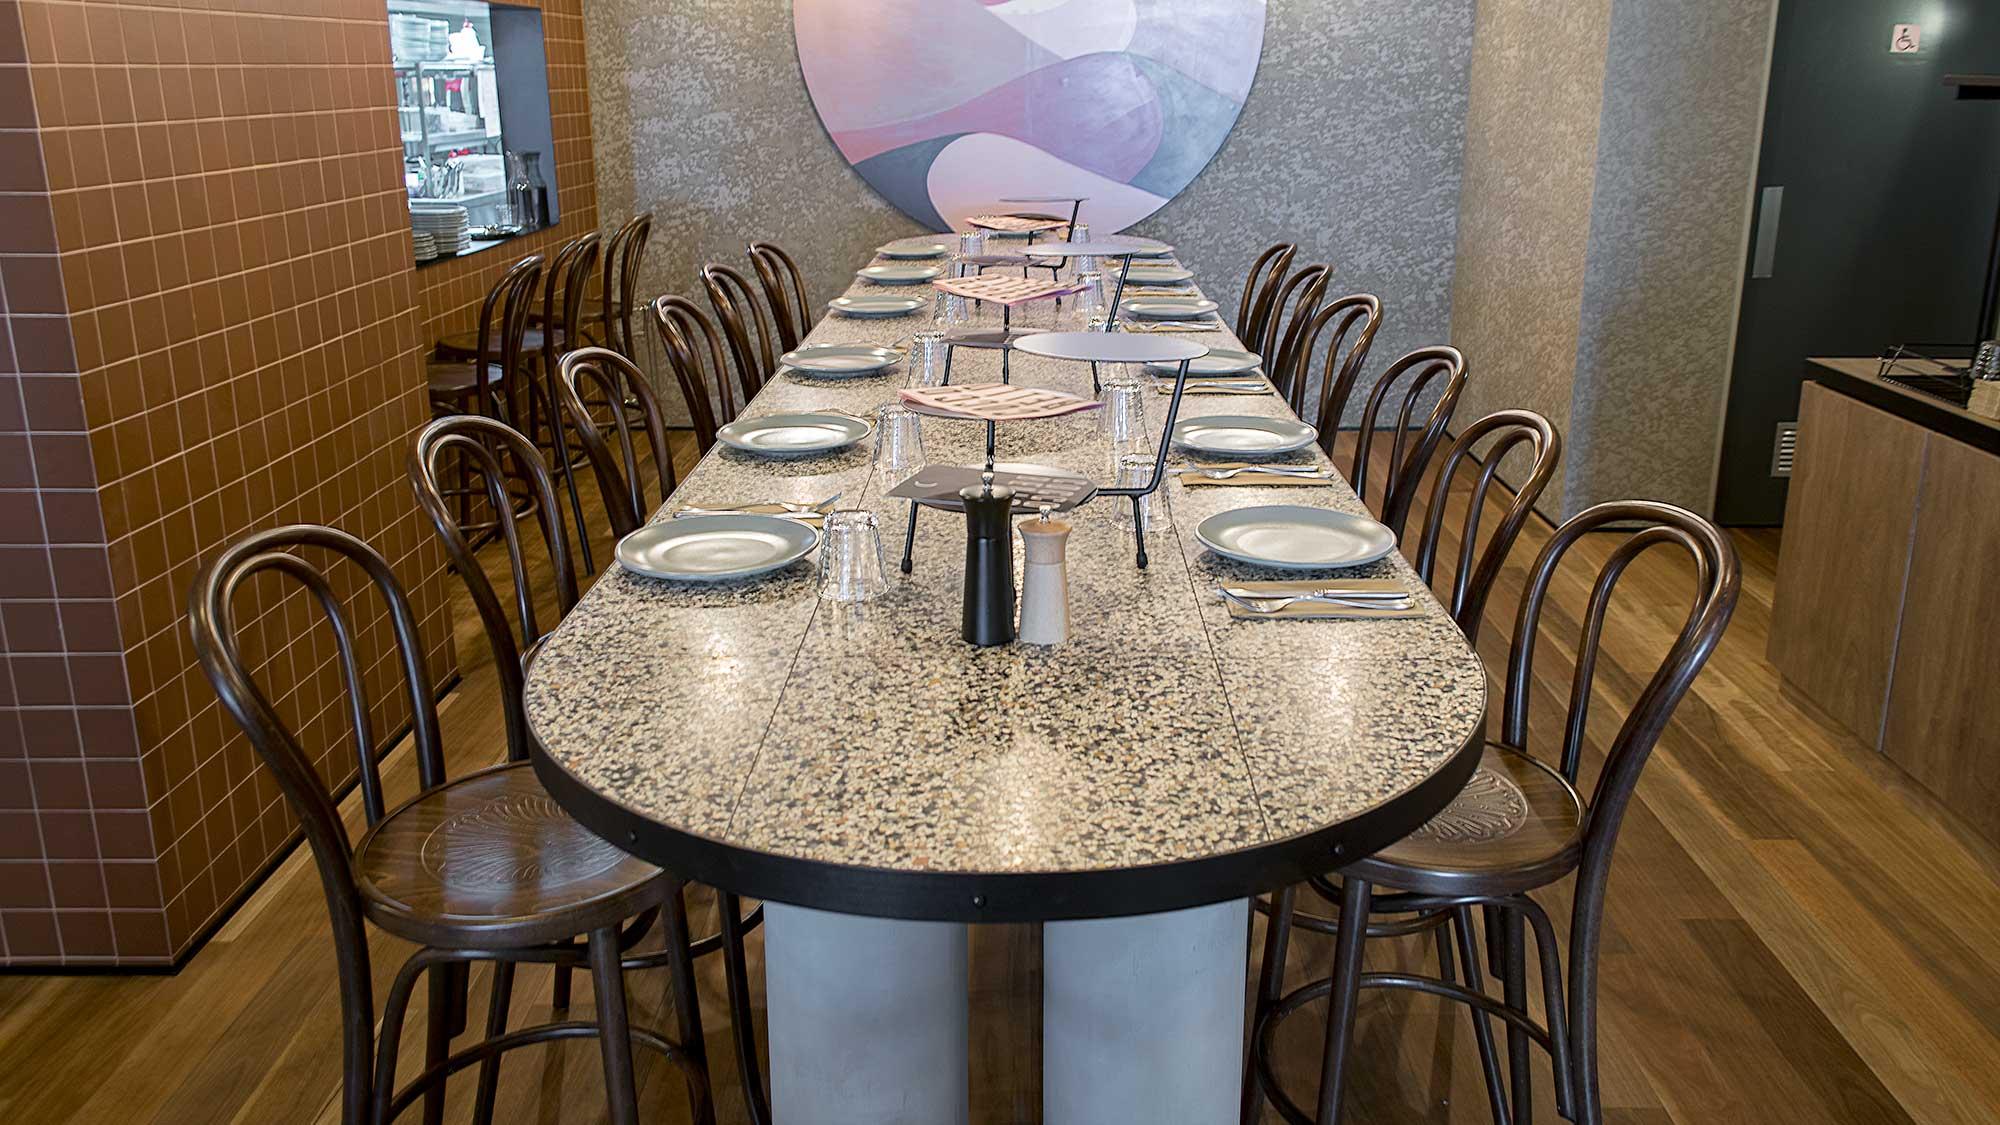 Coccobello Restaruant - Bentwood Barstools